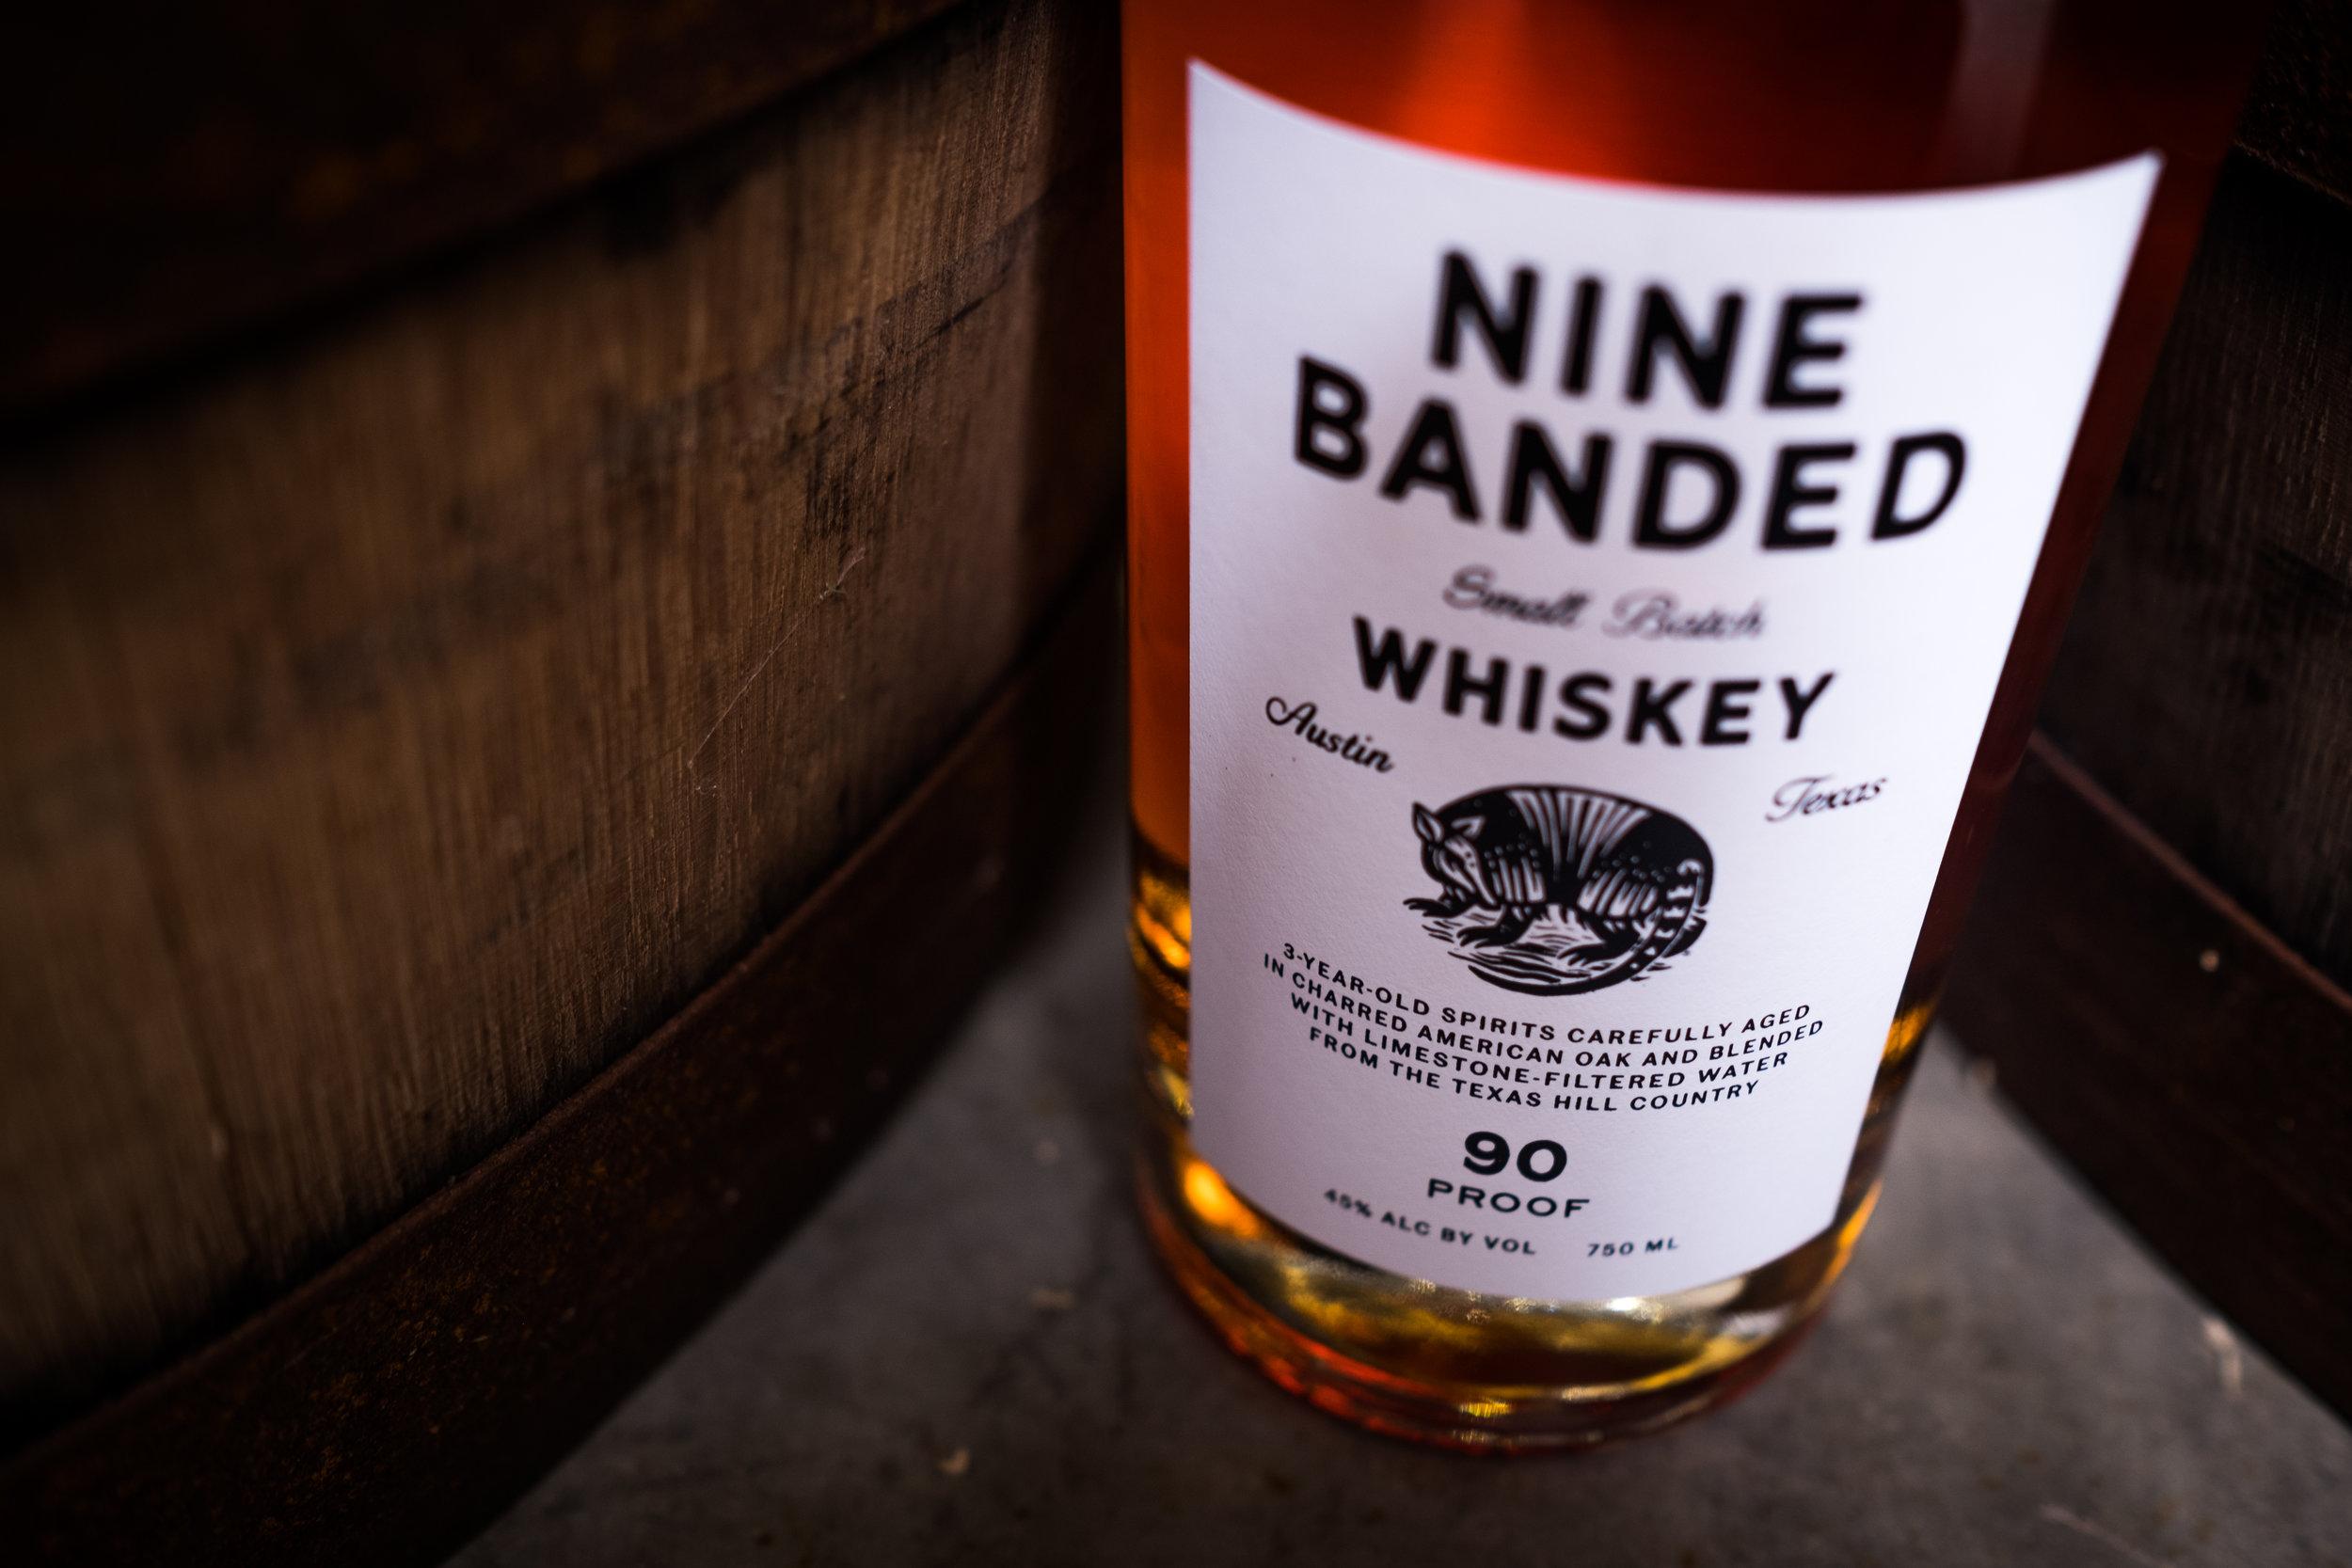 Bailey_Toksoz_Photography_Austin_Texas_Nine_Banded_Whiskey_Bottling_Day_High_Res-13.jpg